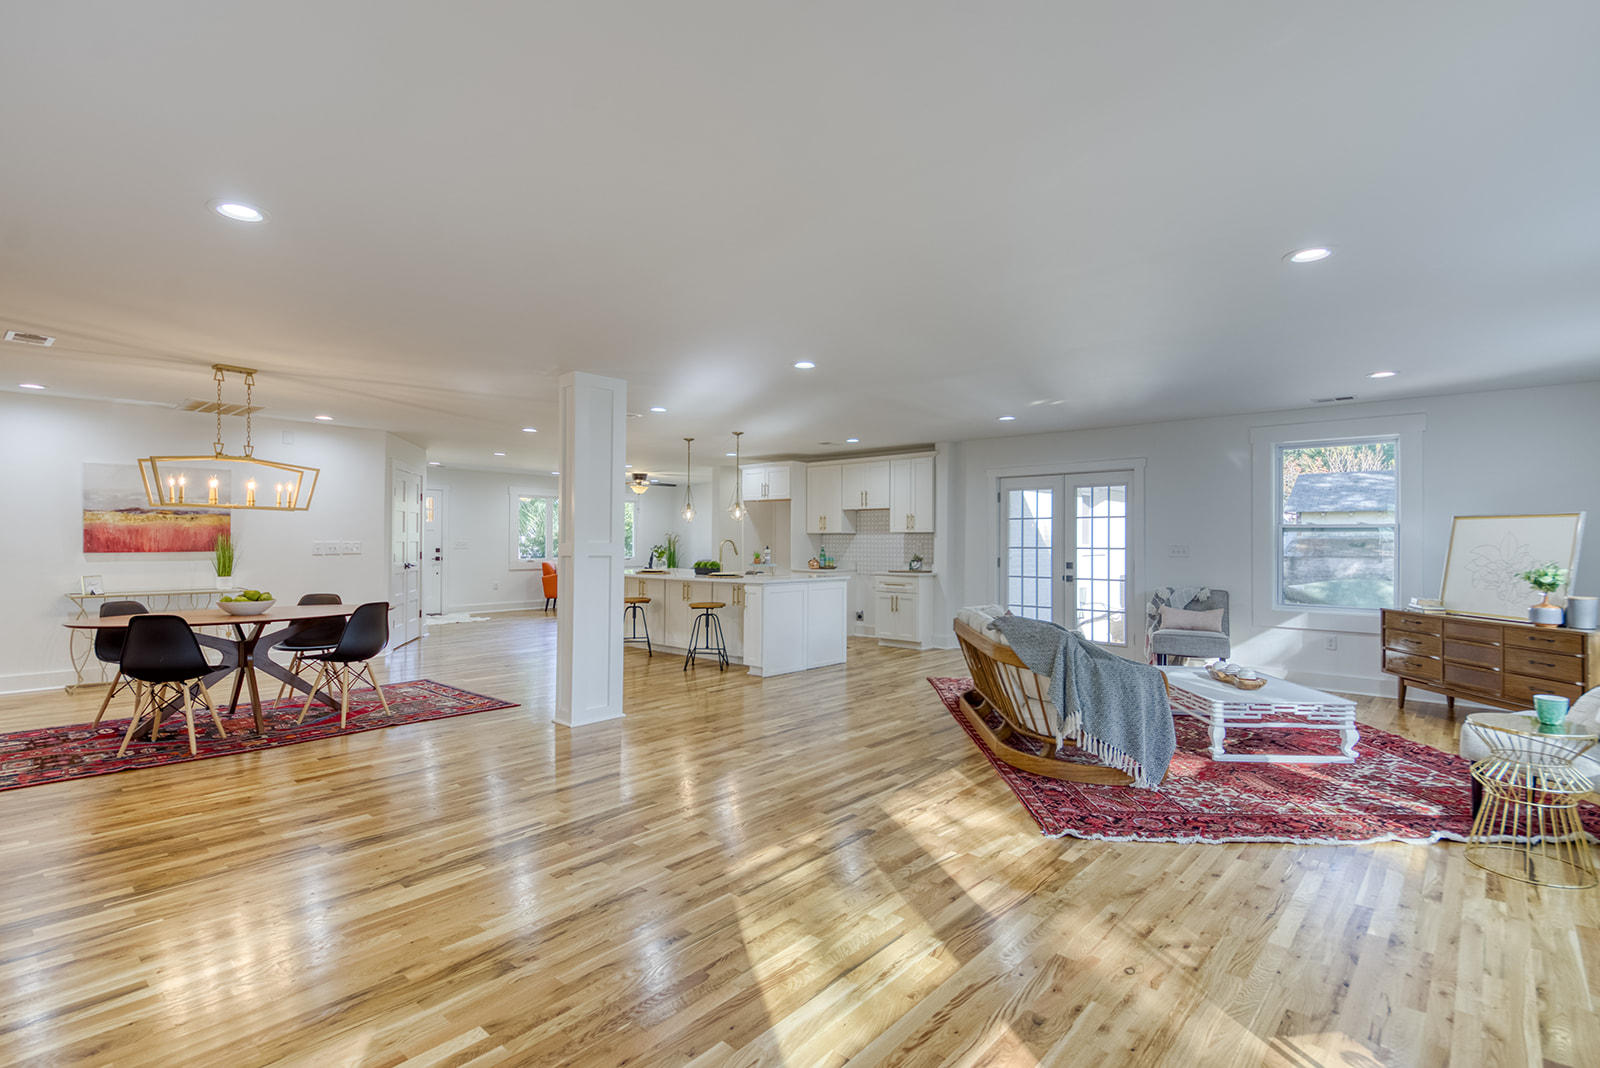 Bay View Acres Homes For Sale - 265 Coleman, Mount Pleasant, SC - 29